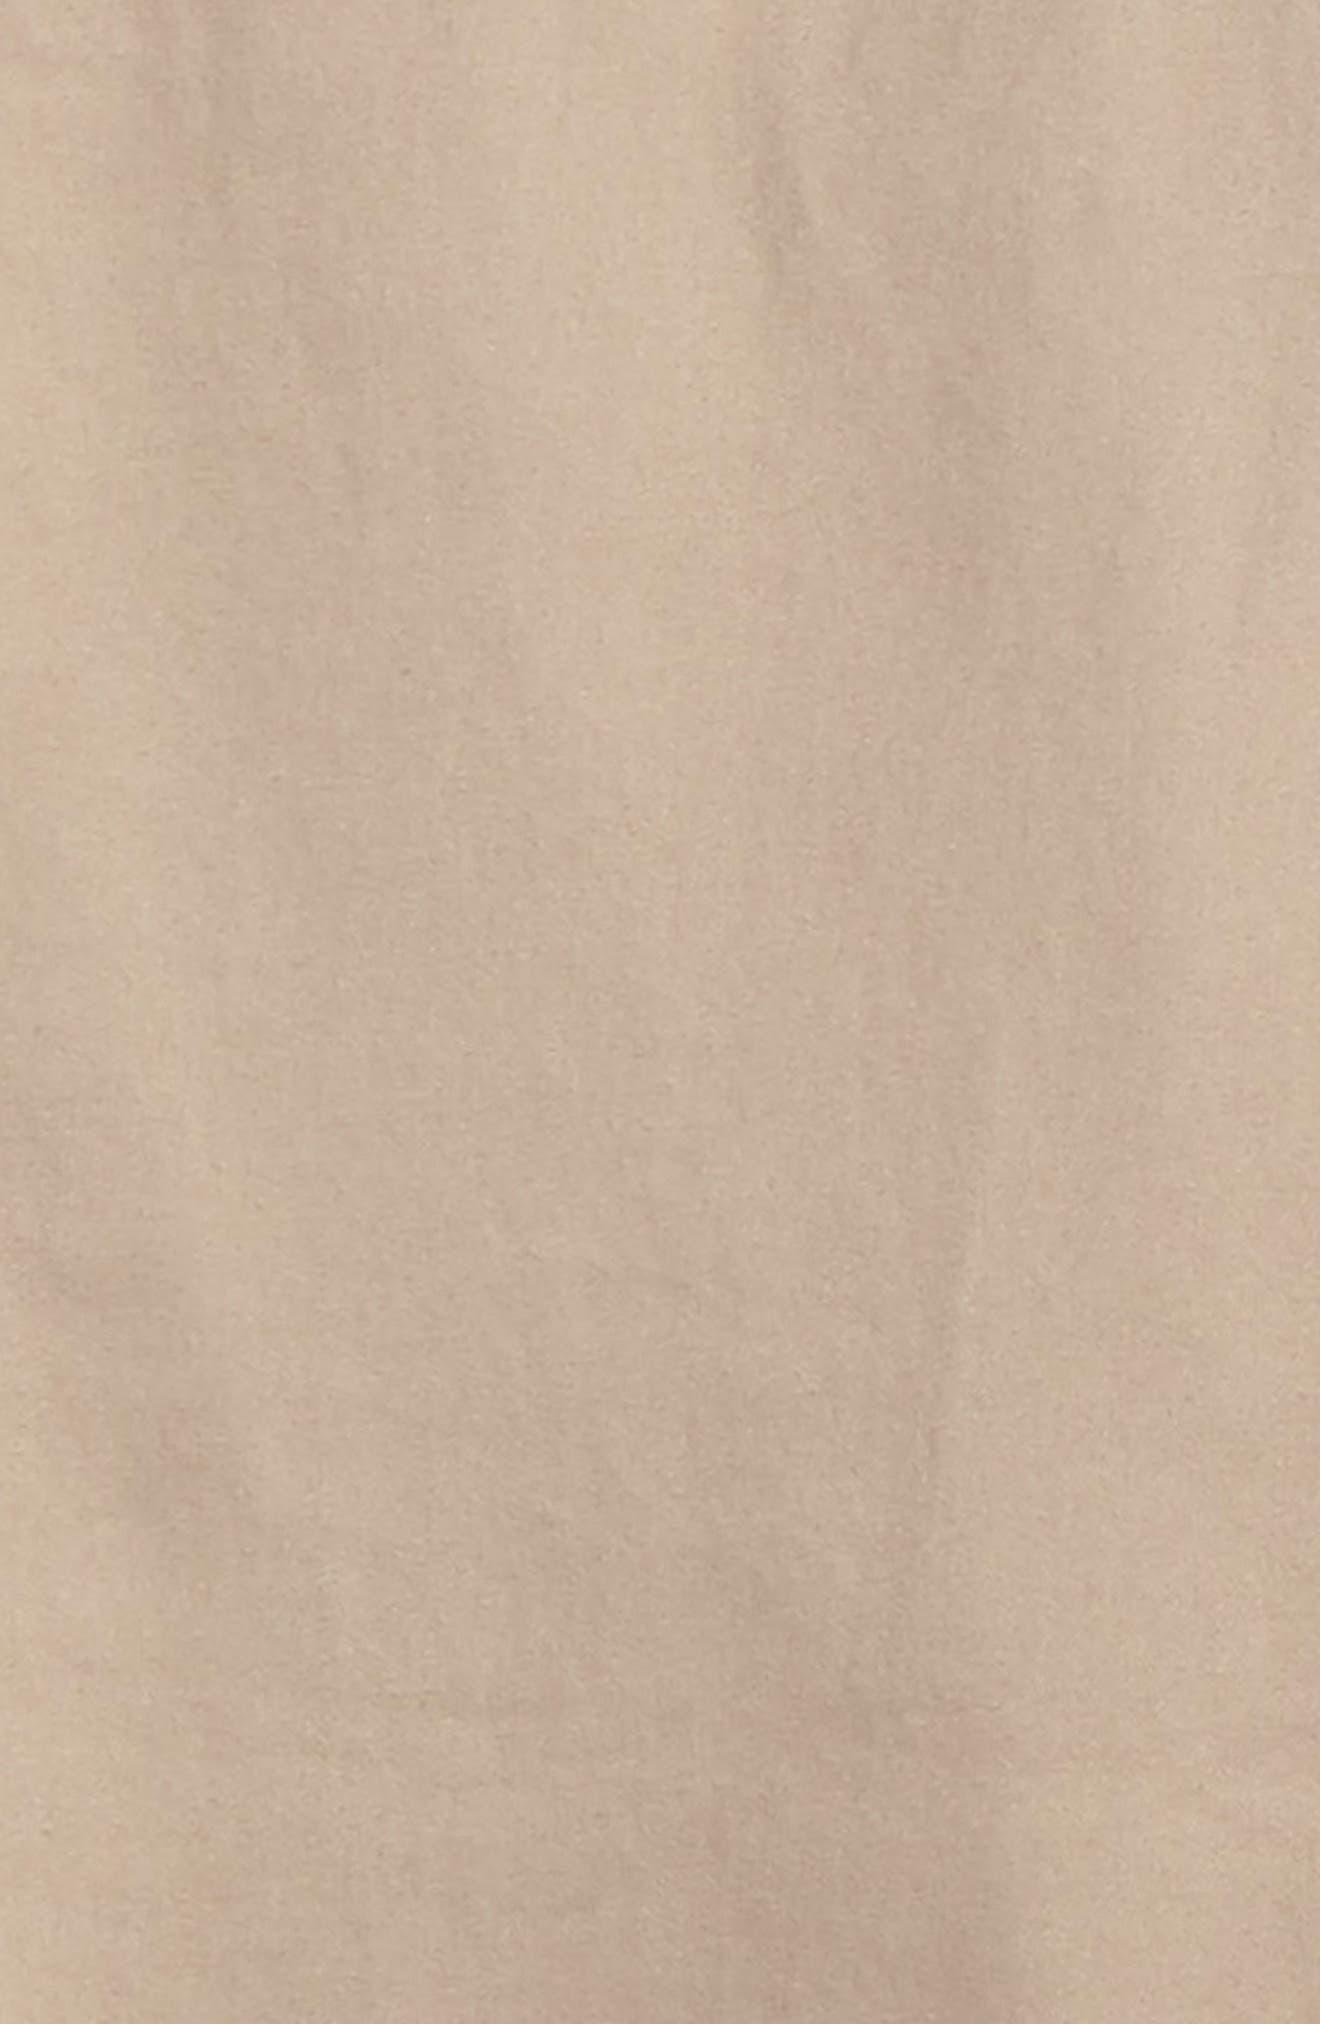 Breaker Flannel Lined Pants,                             Alternate thumbnail 2, color,                             Khaki